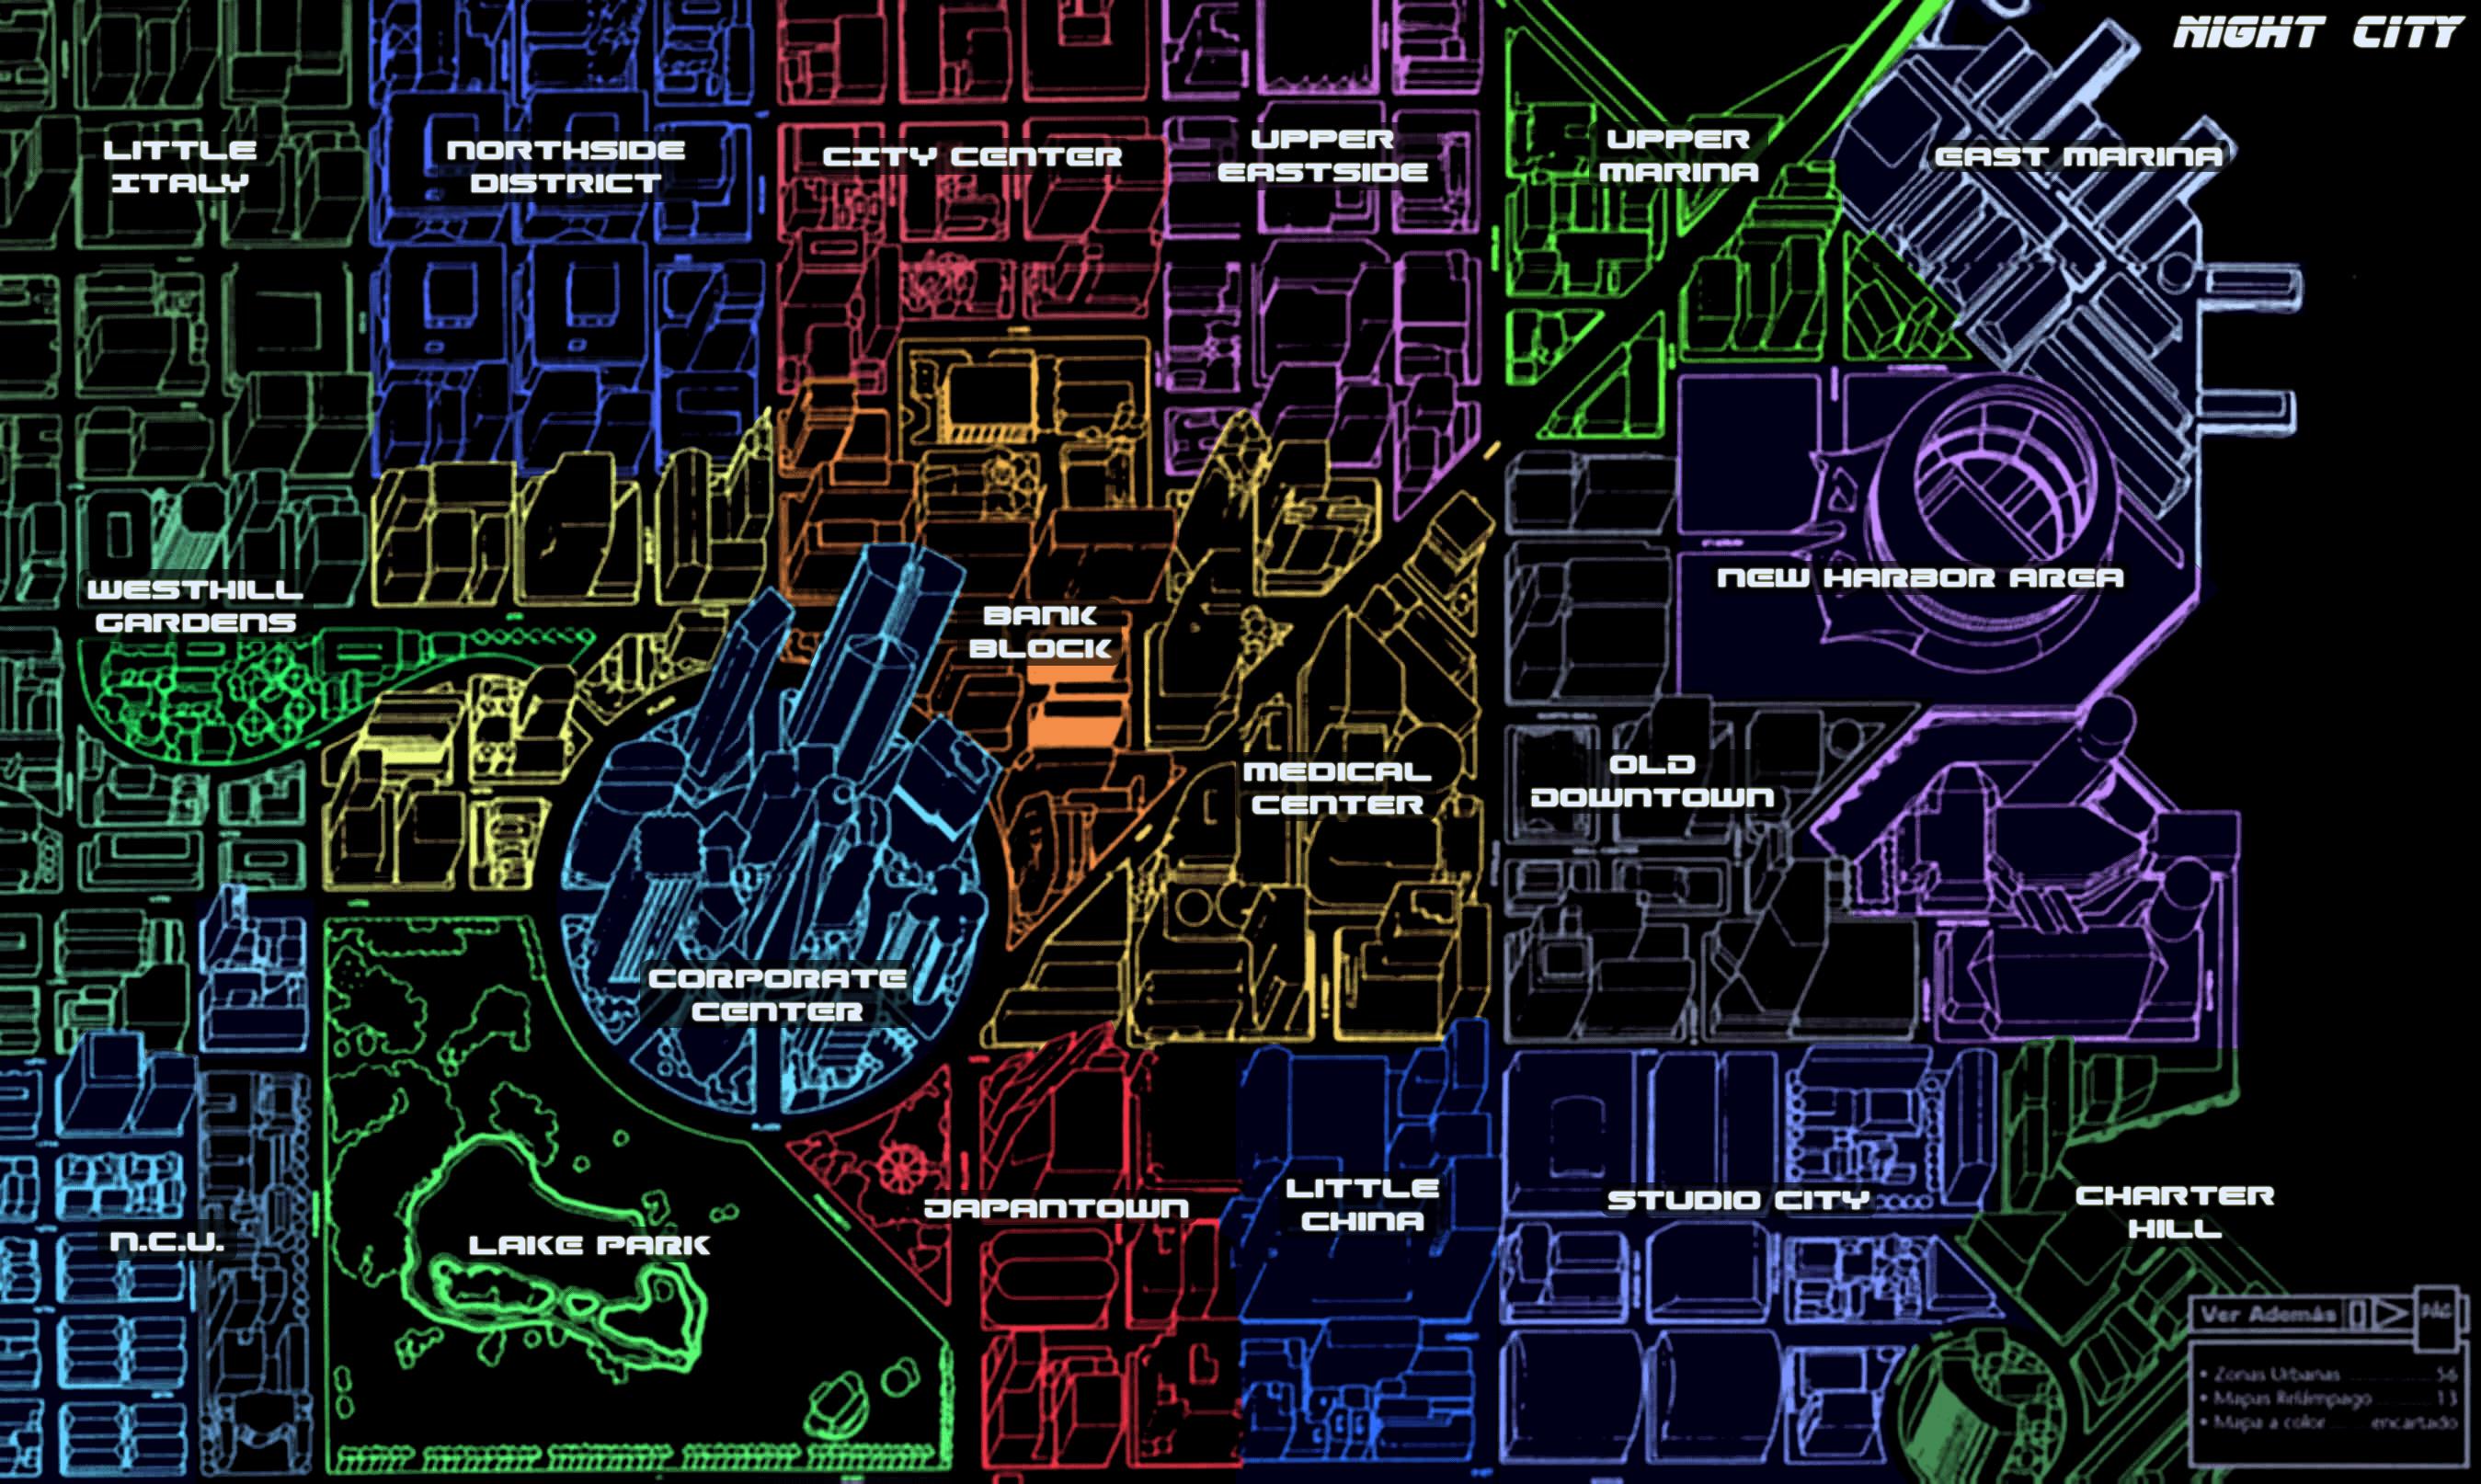 Venture_City_Map.jpg